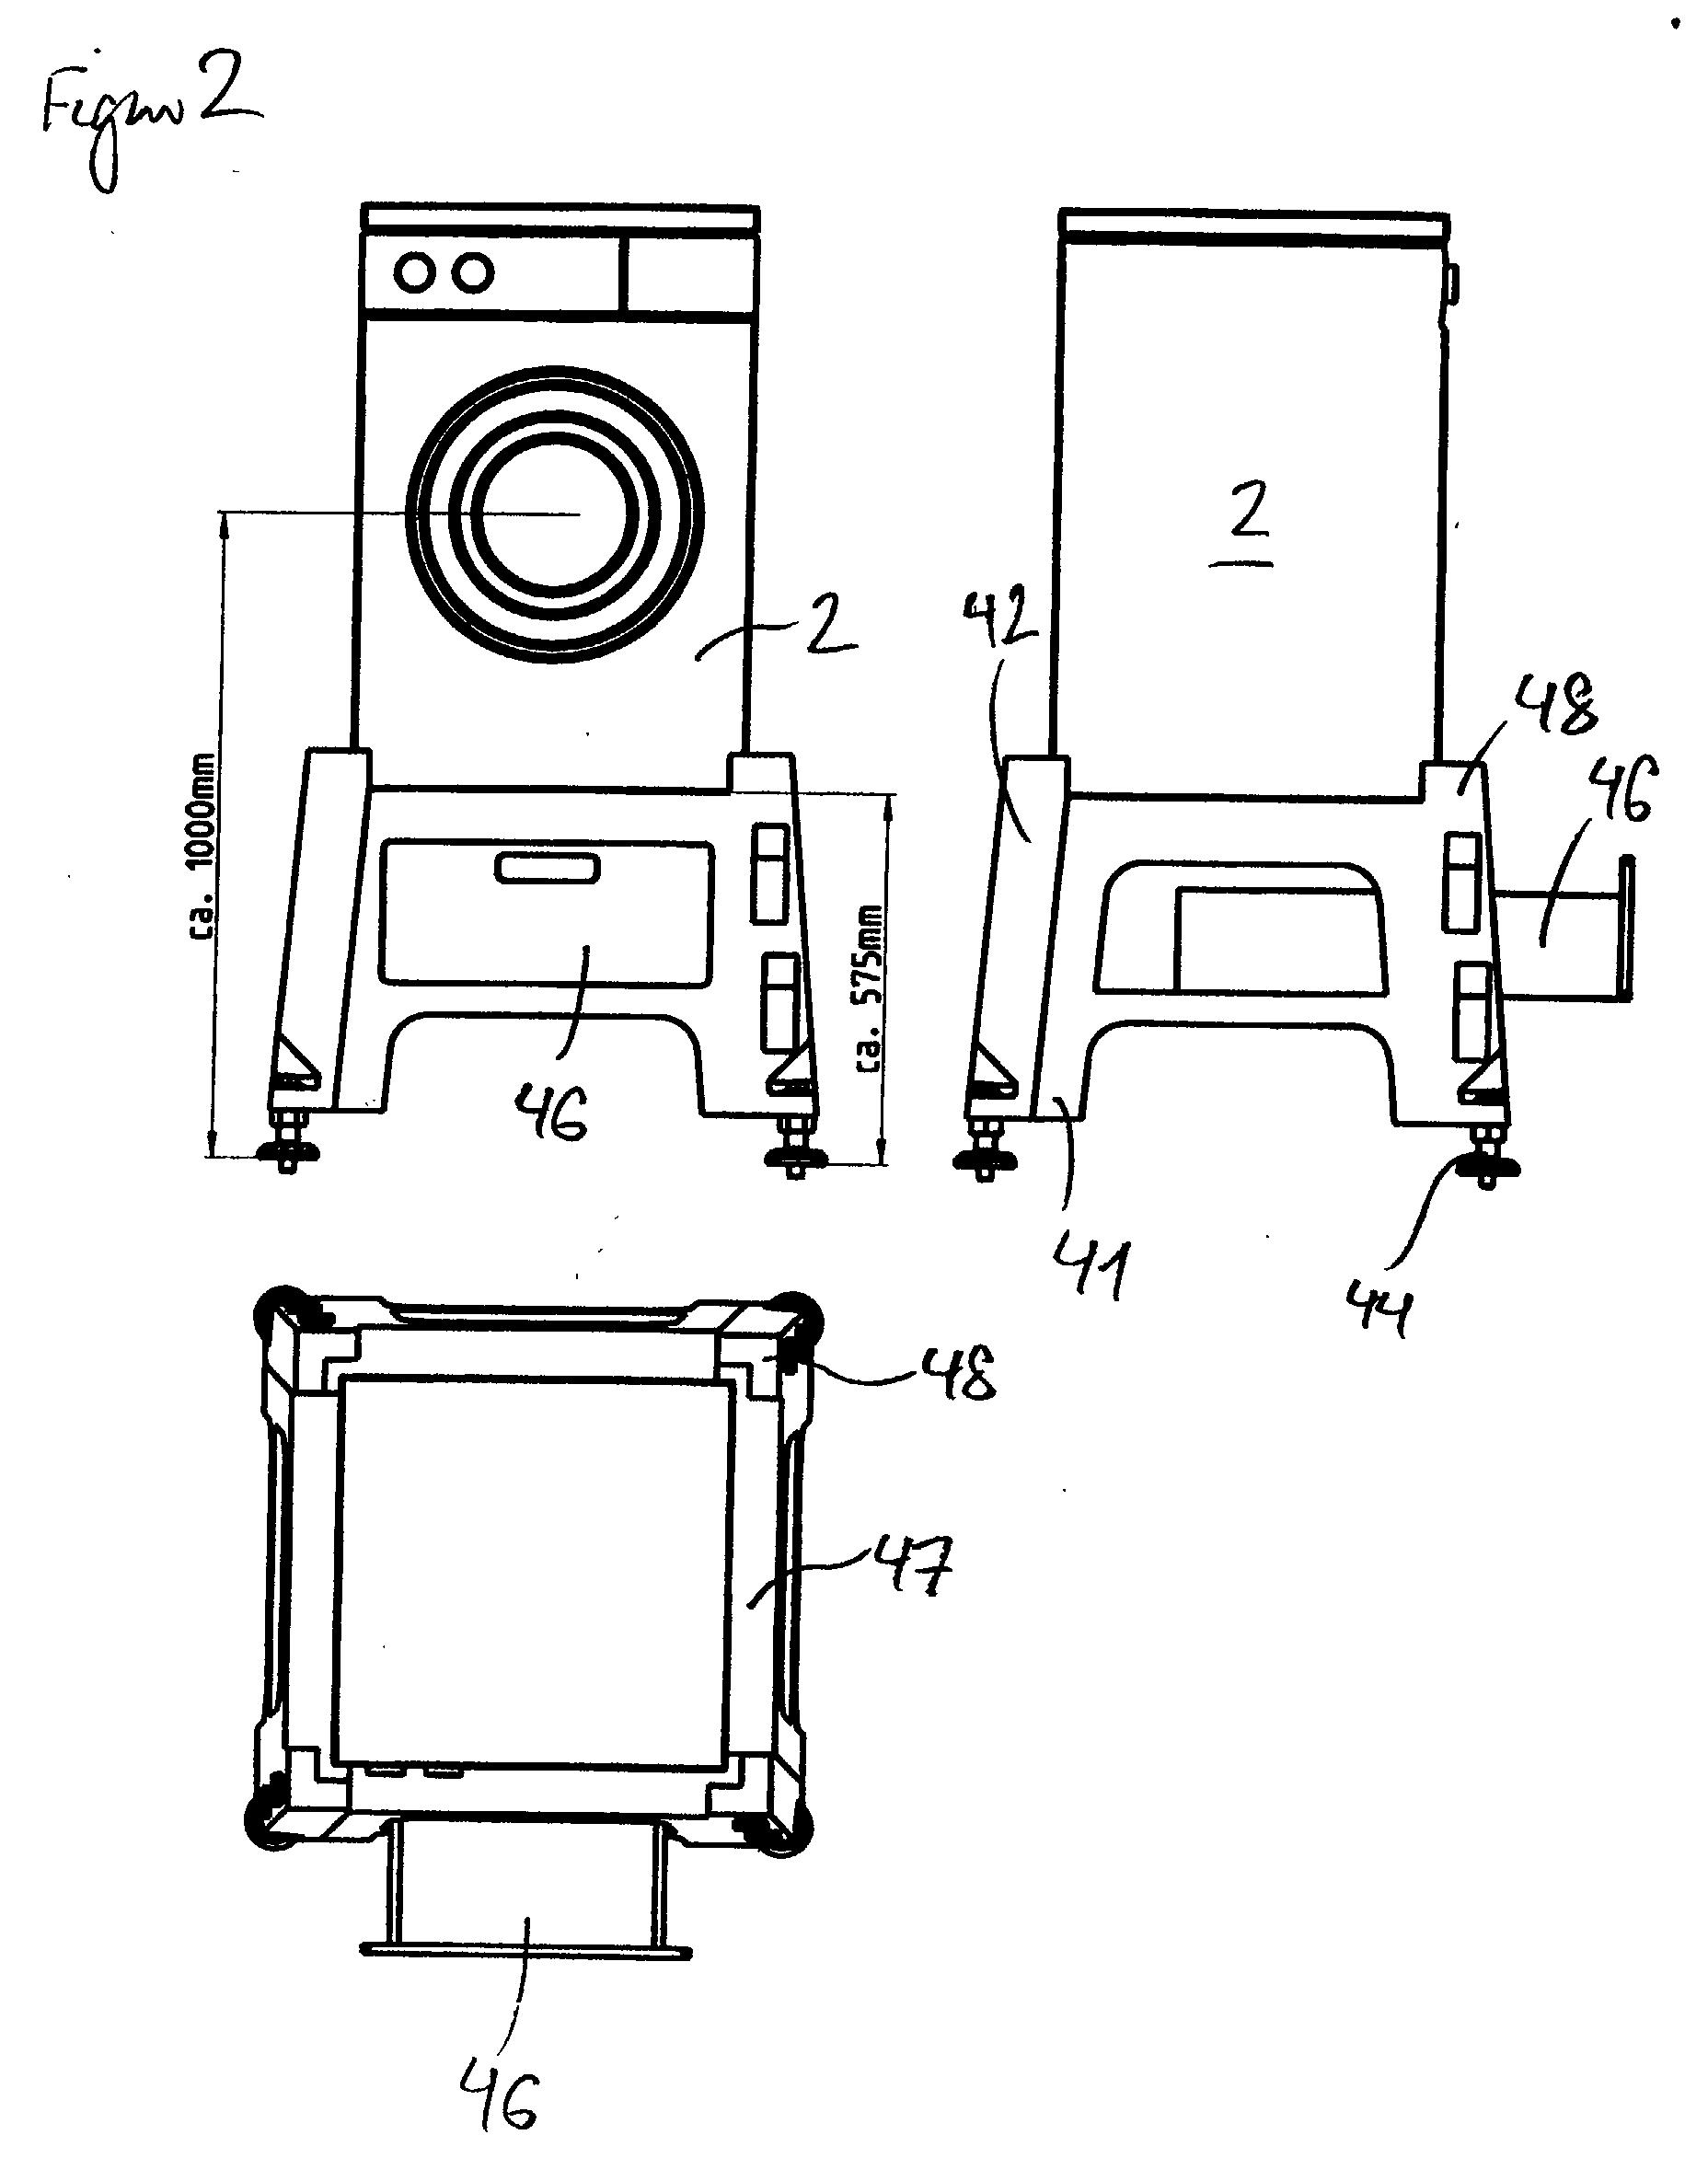 patent ep1205129a1 mehrteiliger sockel f r elektroger te insbesondere waschmaschinen google. Black Bedroom Furniture Sets. Home Design Ideas